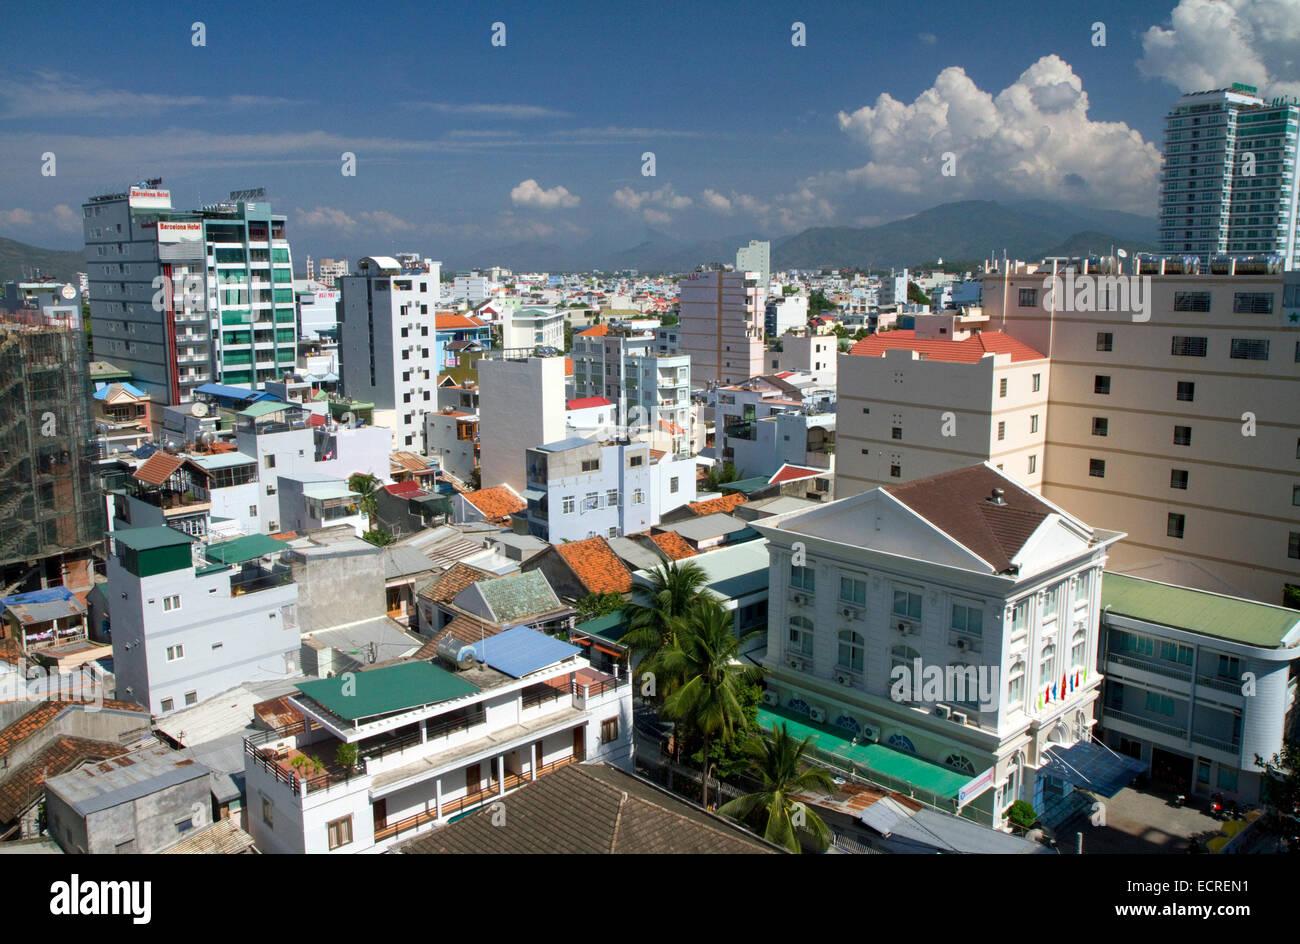 Cityscape of Nha Trang, Vietnam. Stock Photo